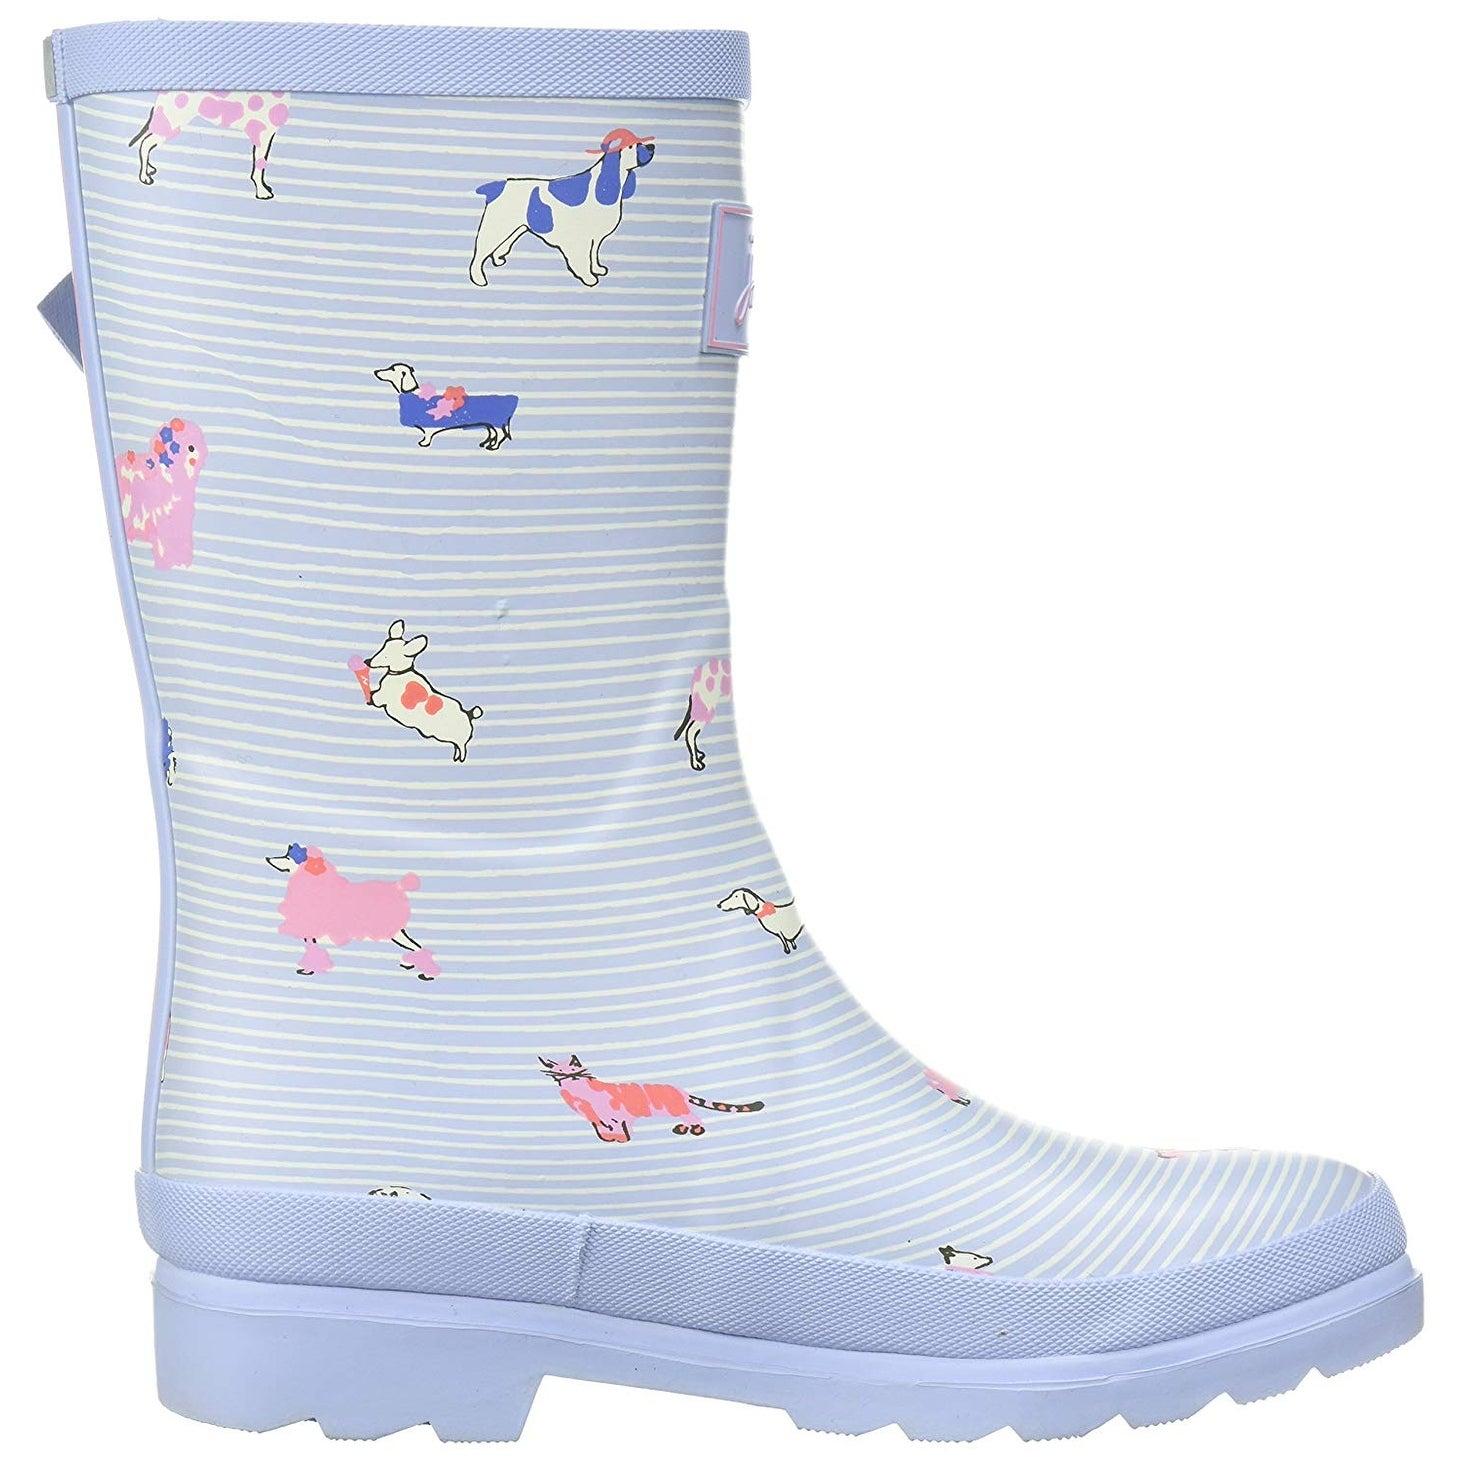 Joules Kids Jnr Welly Print Rain Boot